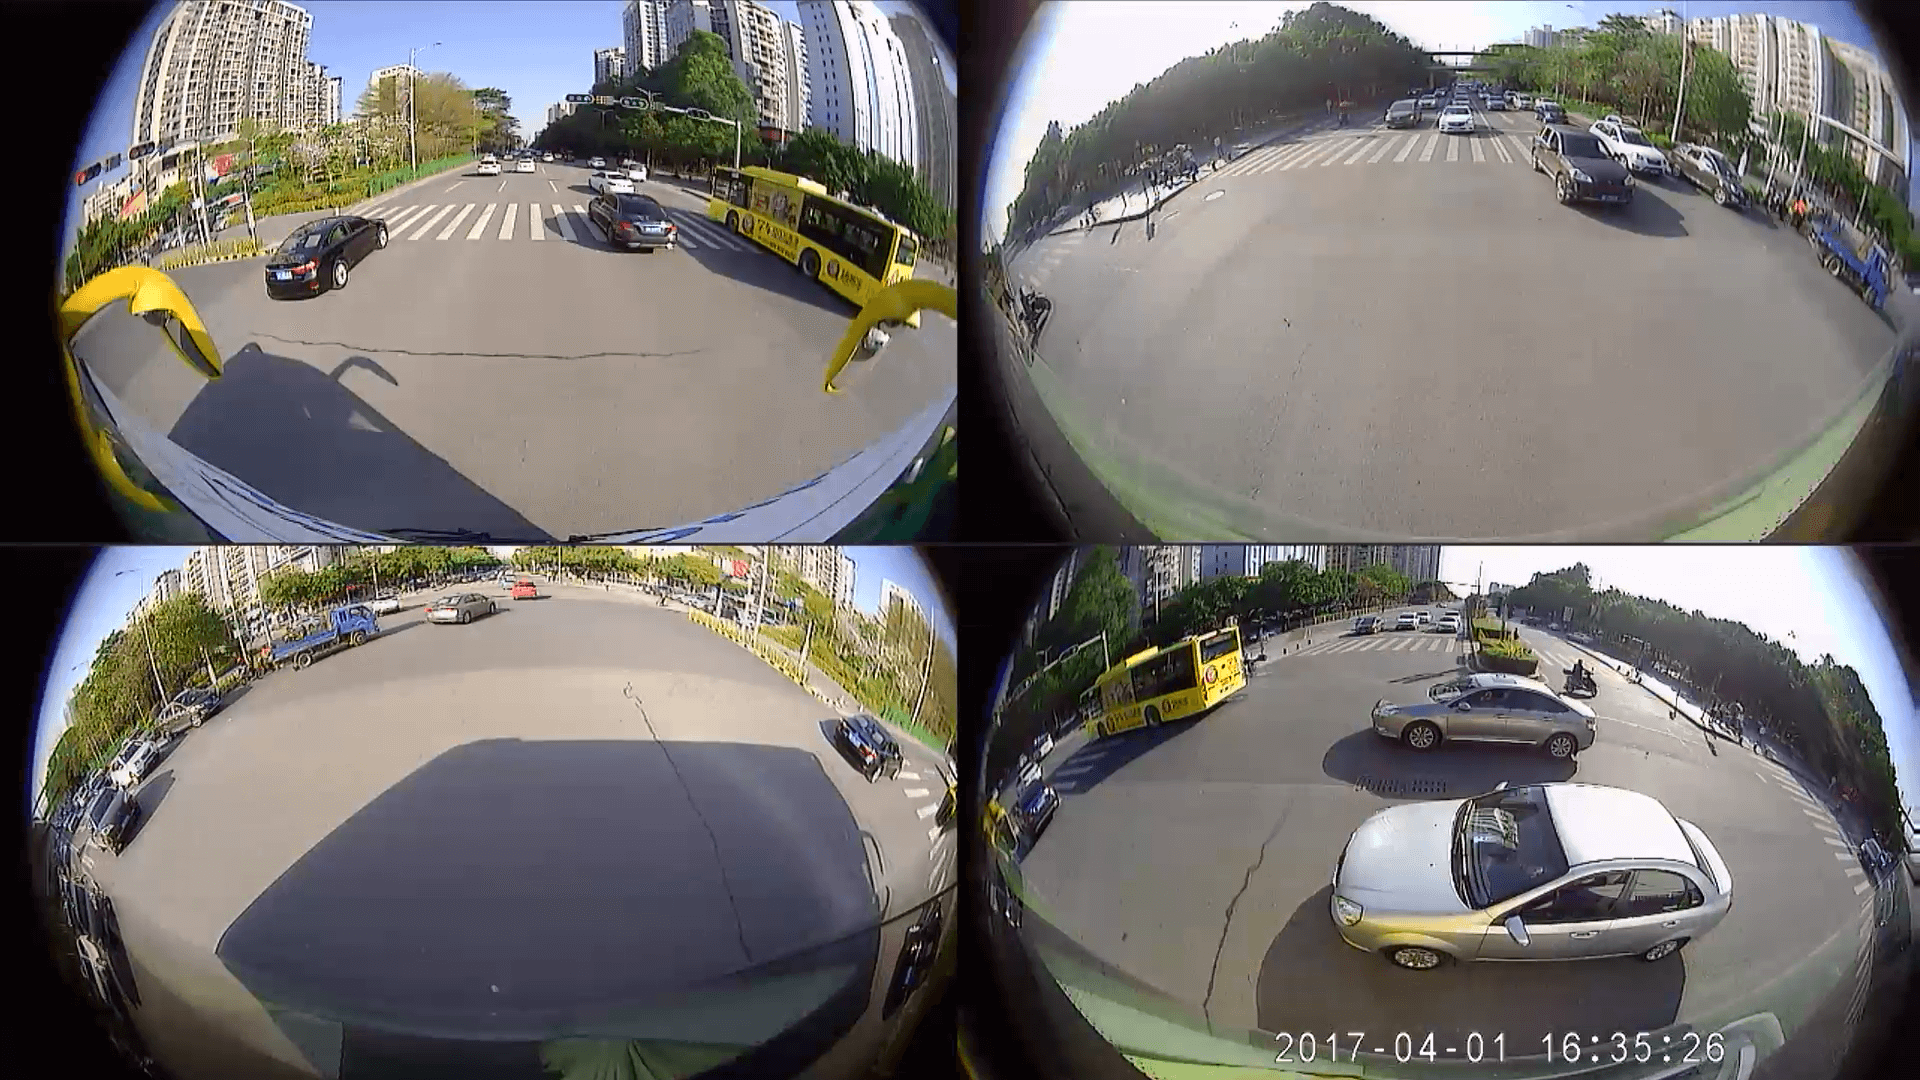 Kocchi's SurroundView™ System Video Footage